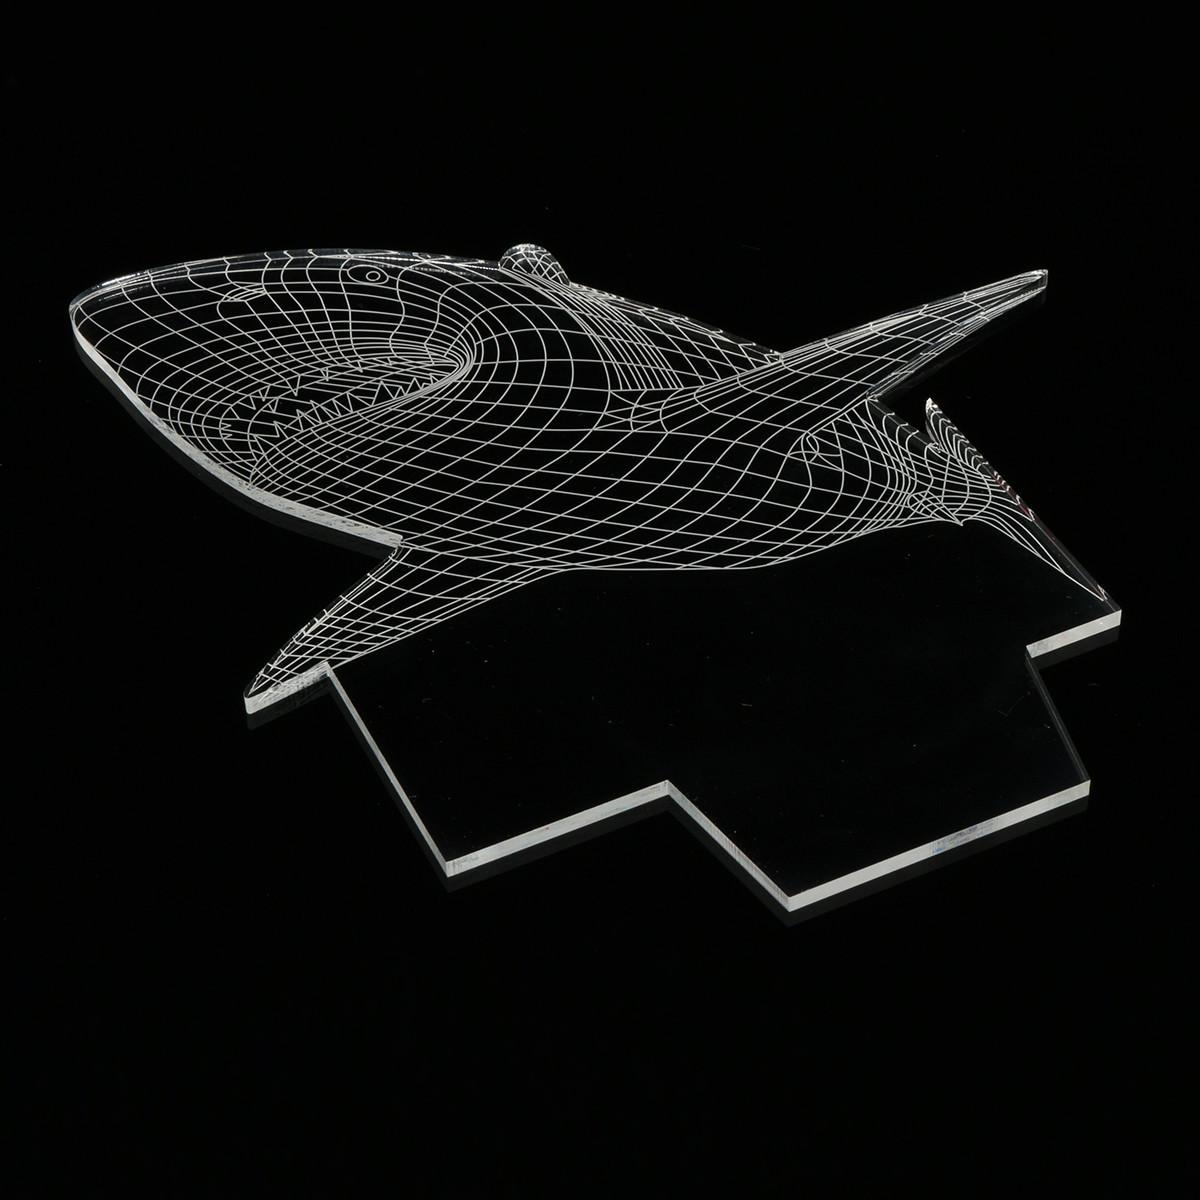 3D Illusion Shark Model LED Desk Lamp 7 Color Change Touch